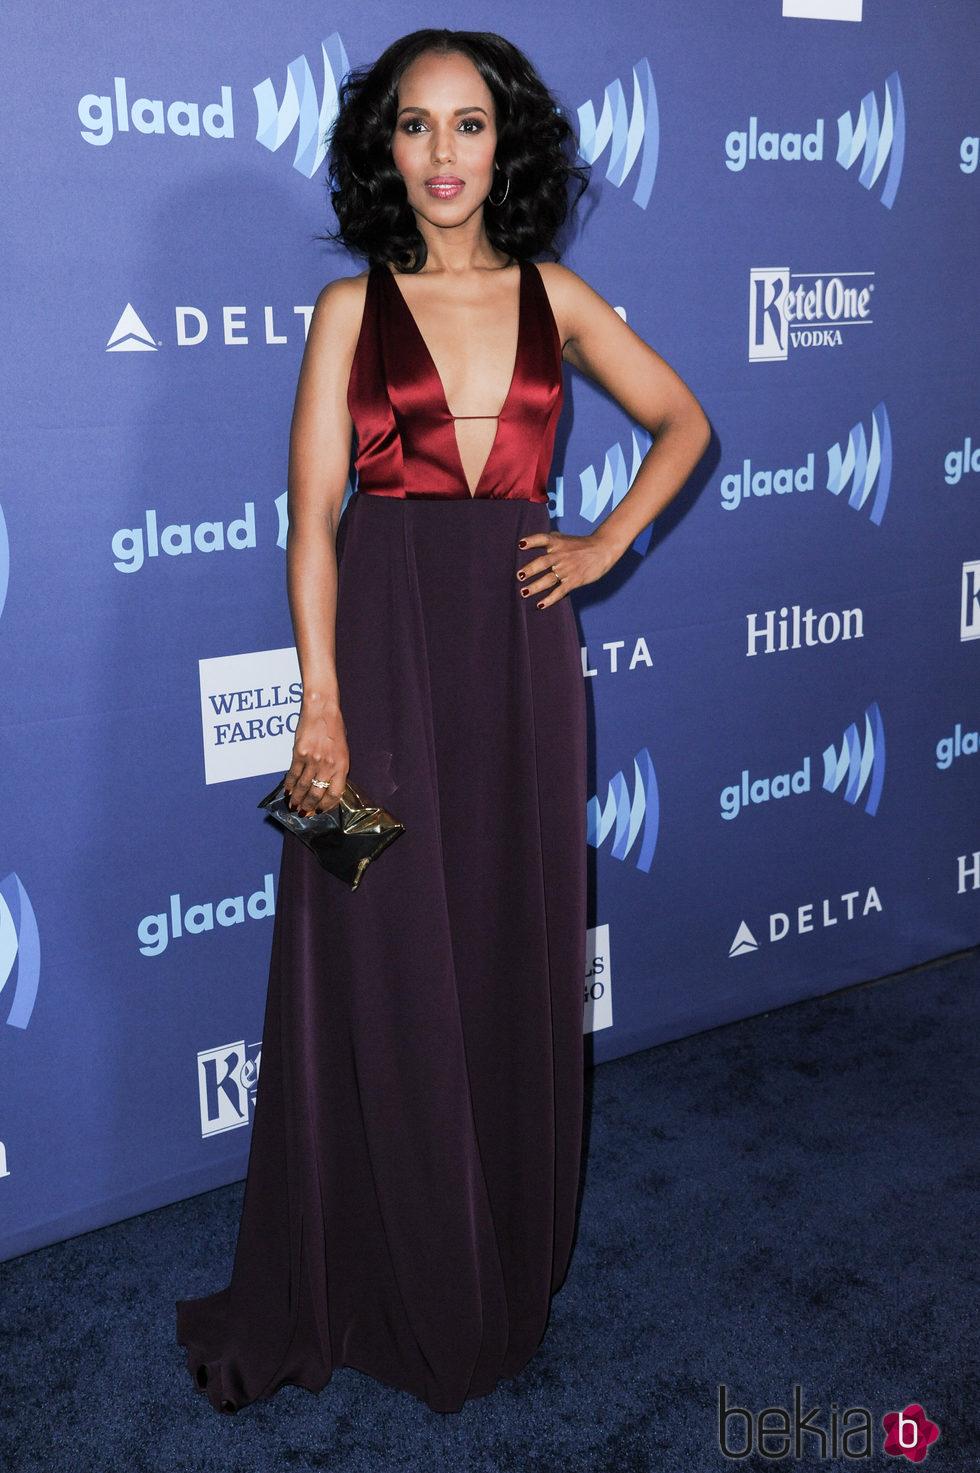 Kerry Washington en los GLAAD Media Awards 2015